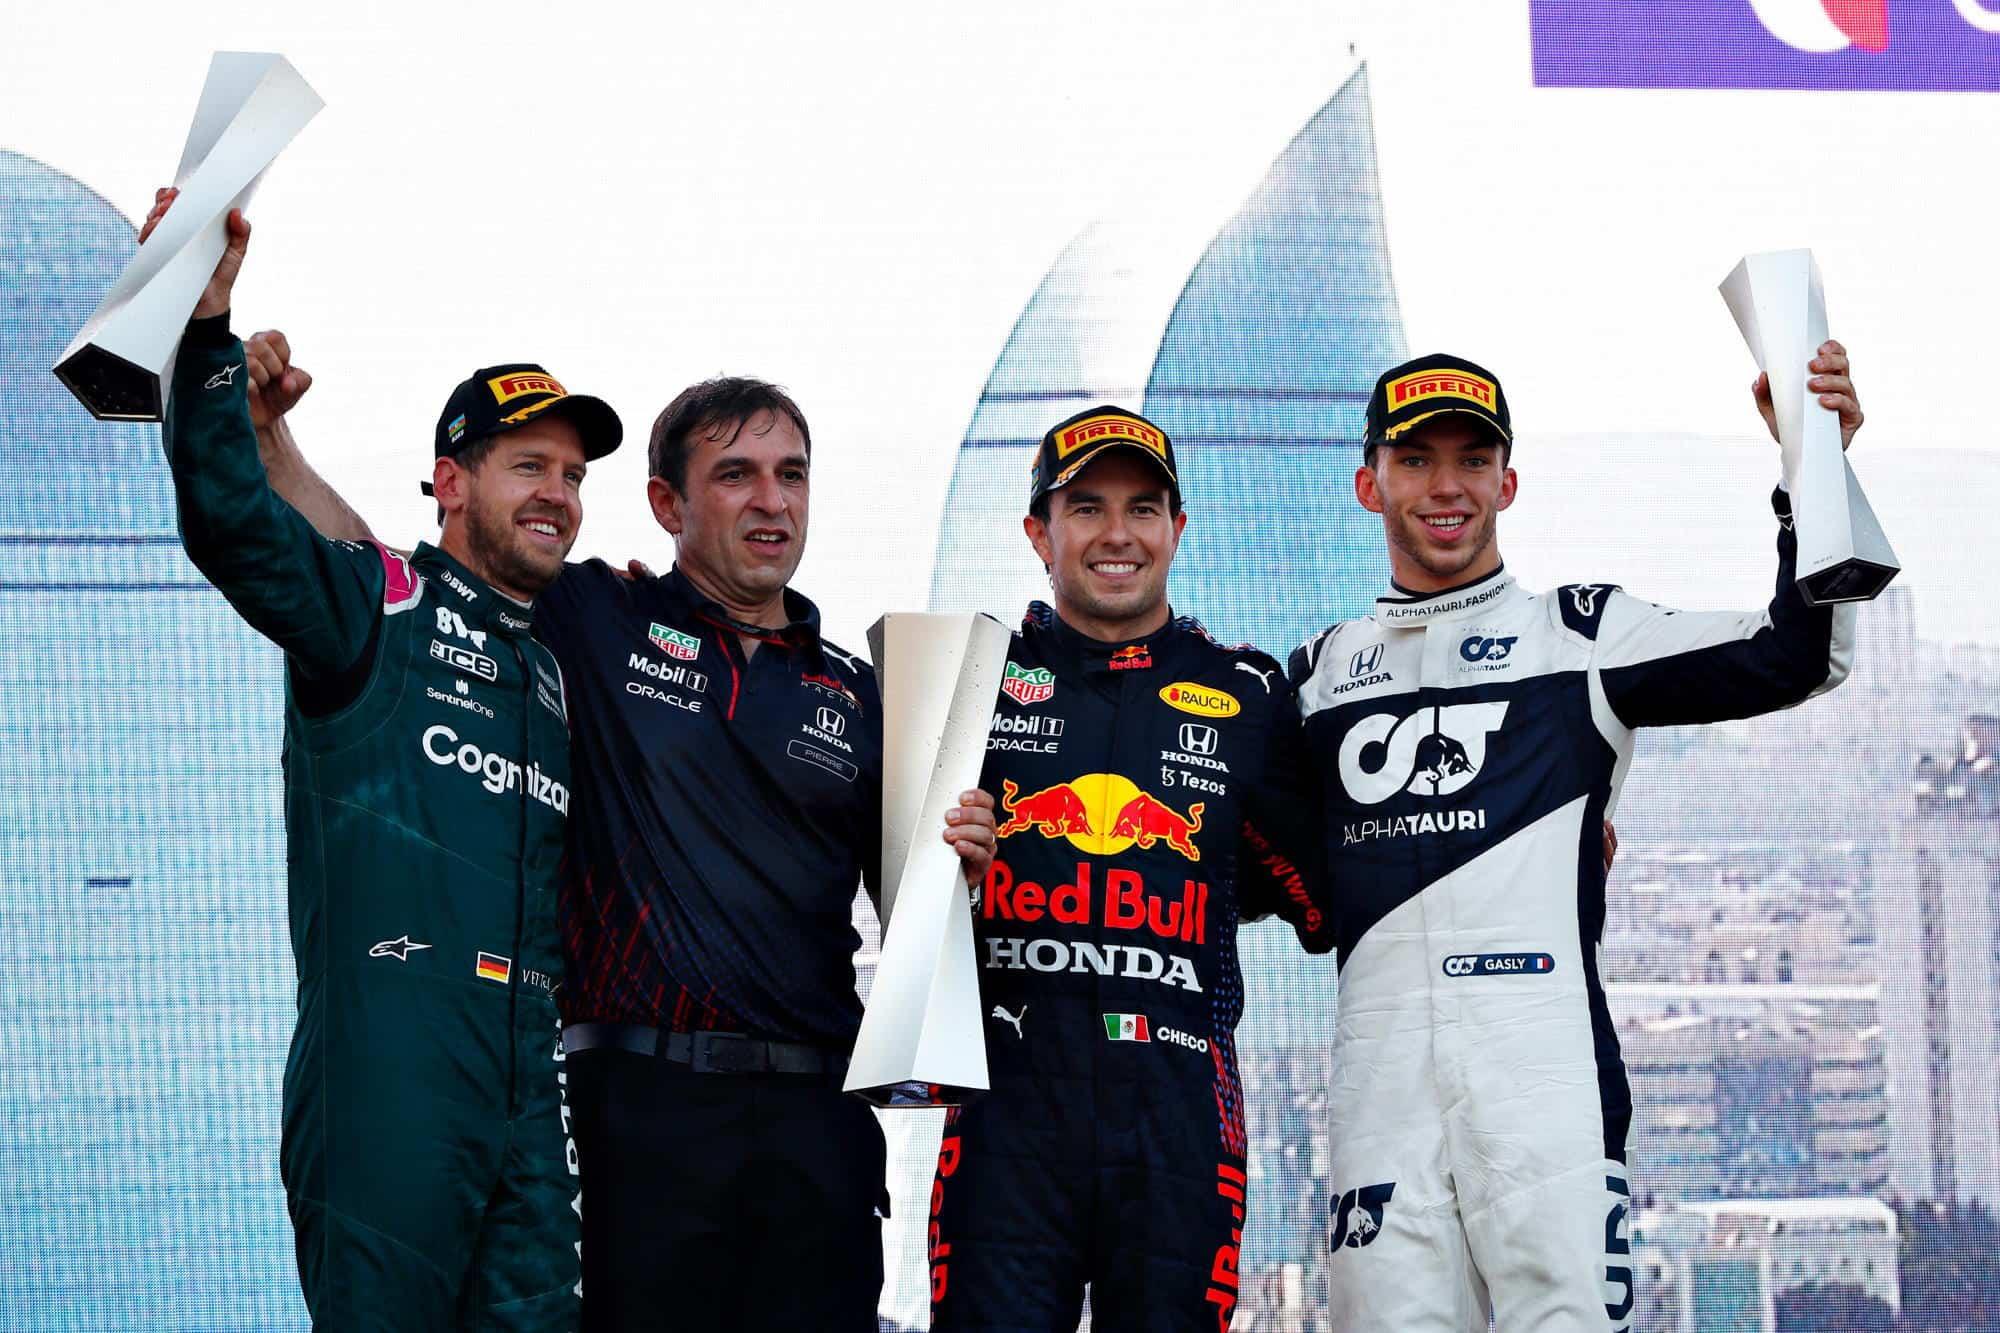 2021 Azerbaijan GP Perez celebrates on the podium with Vettel and Gasly Photo Red Bull